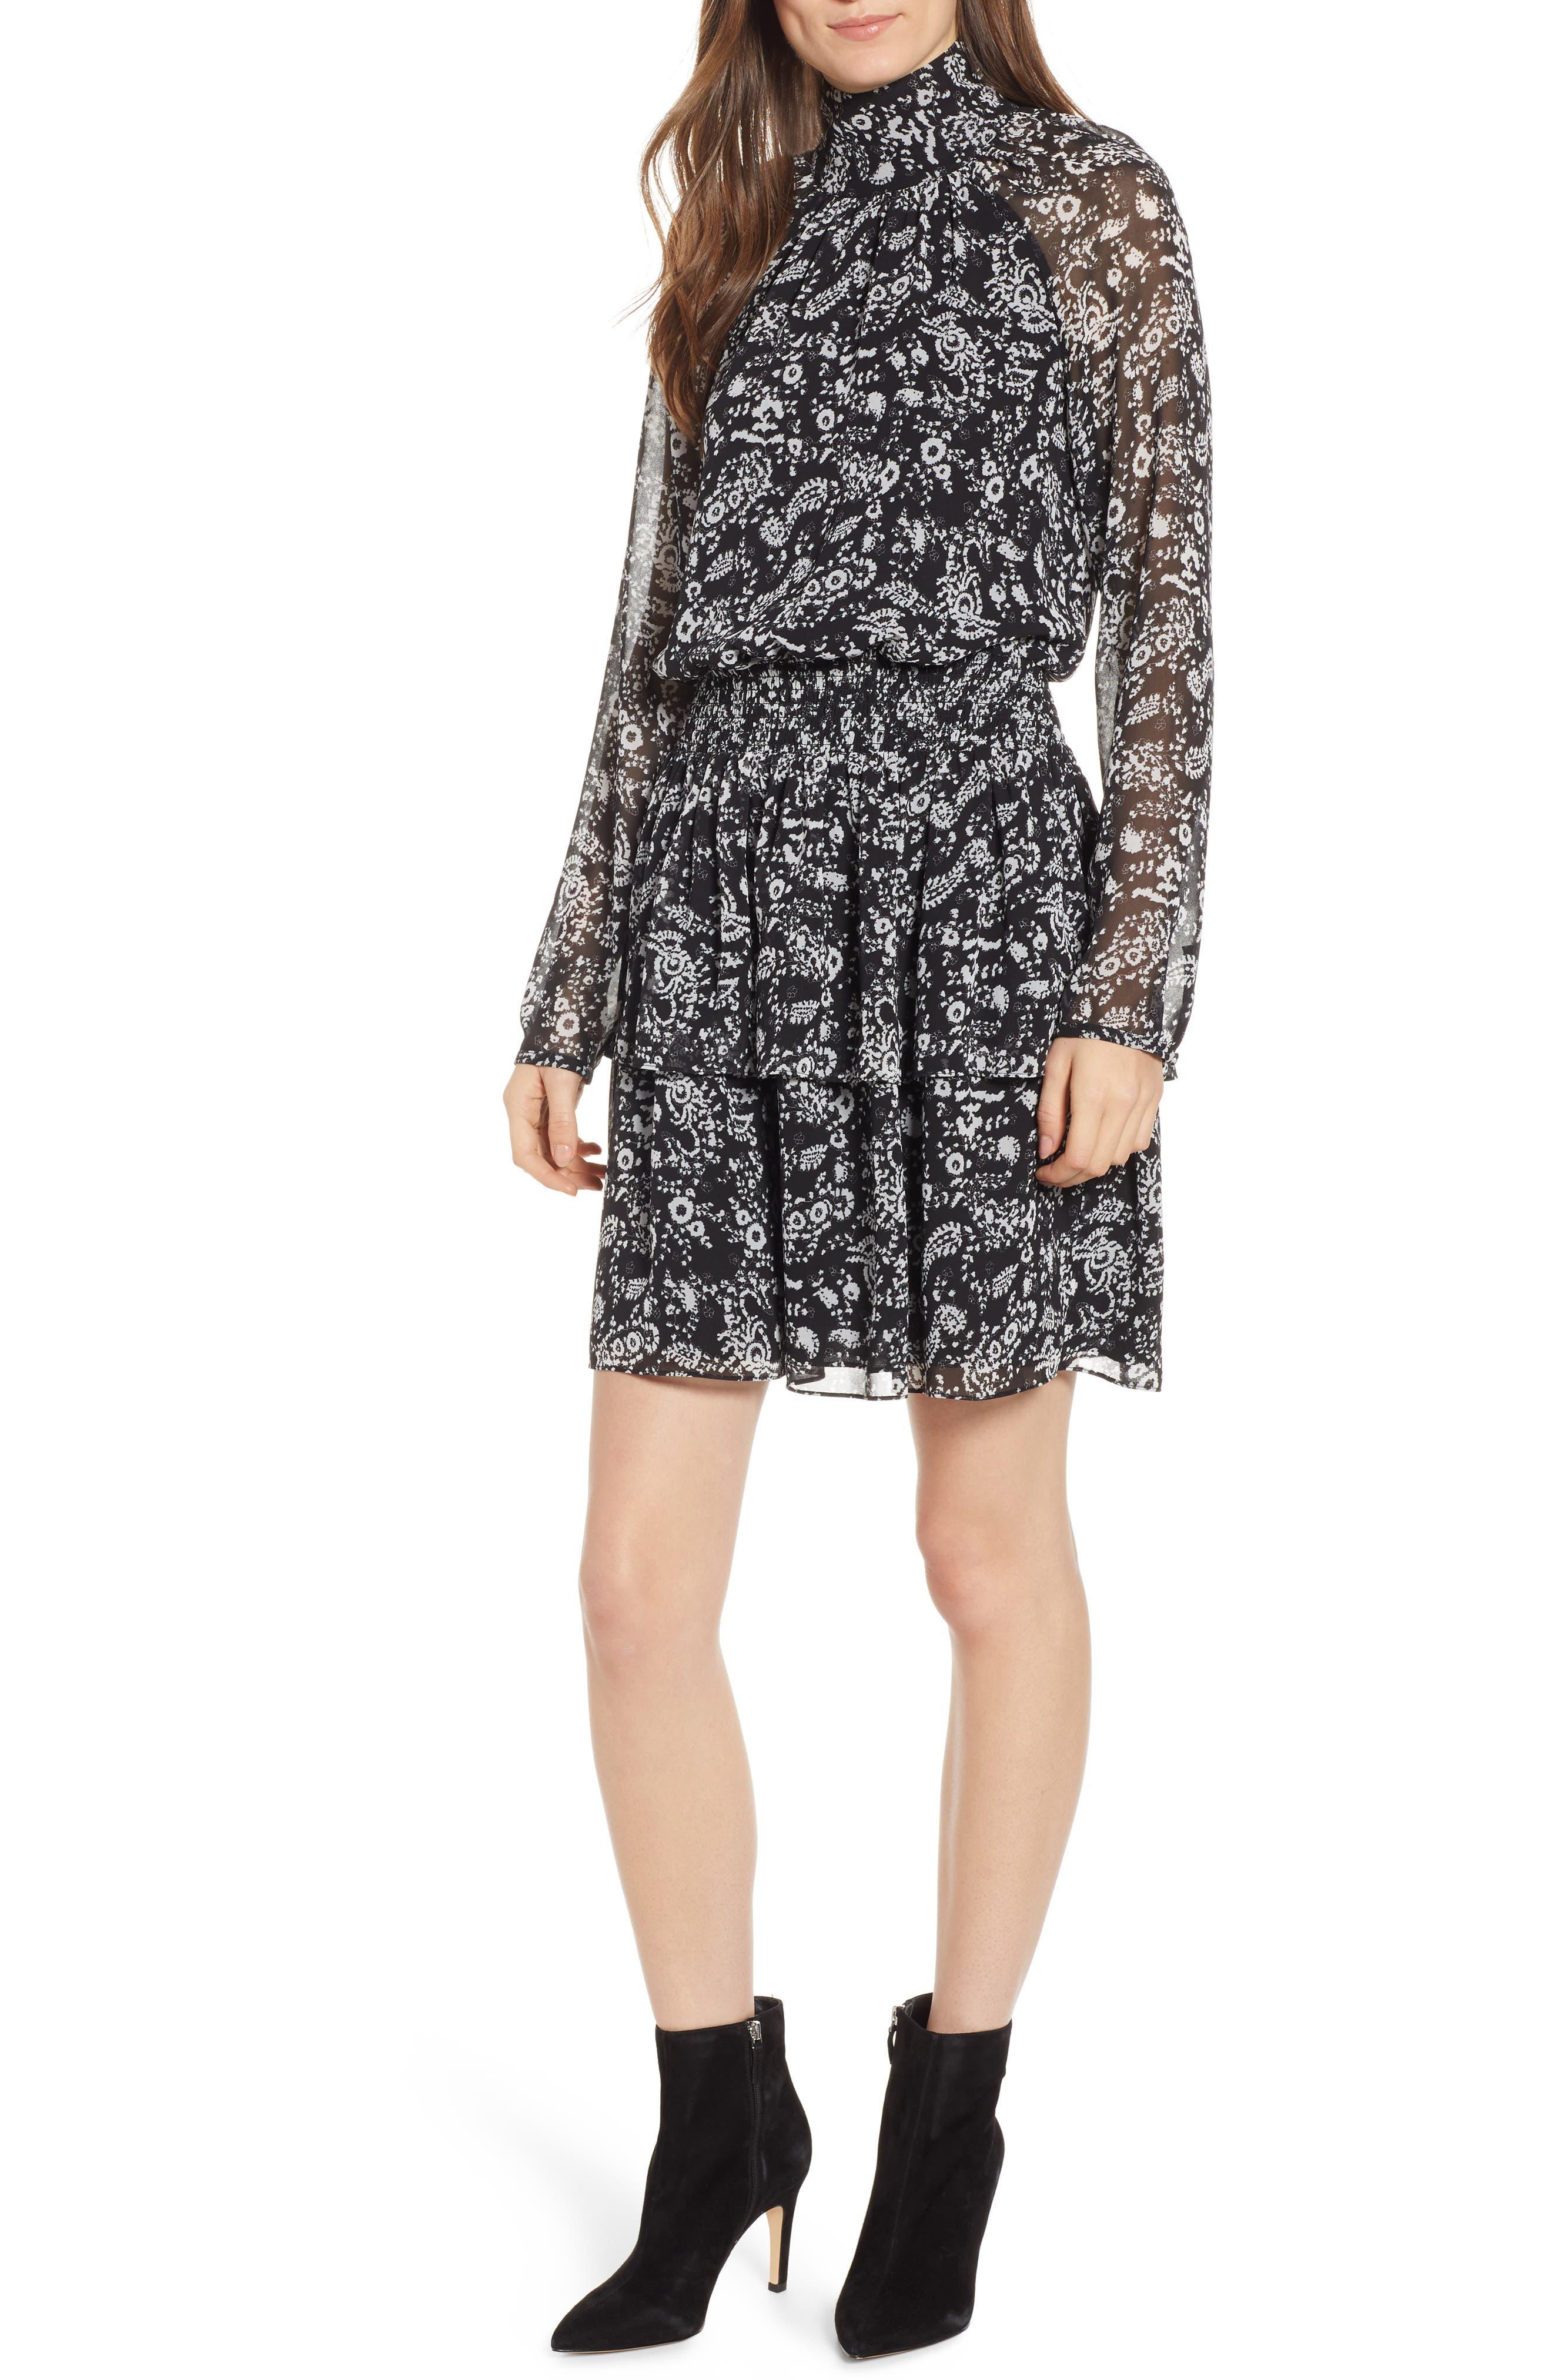 Rebecca Minkoff Zayee Dress, Black